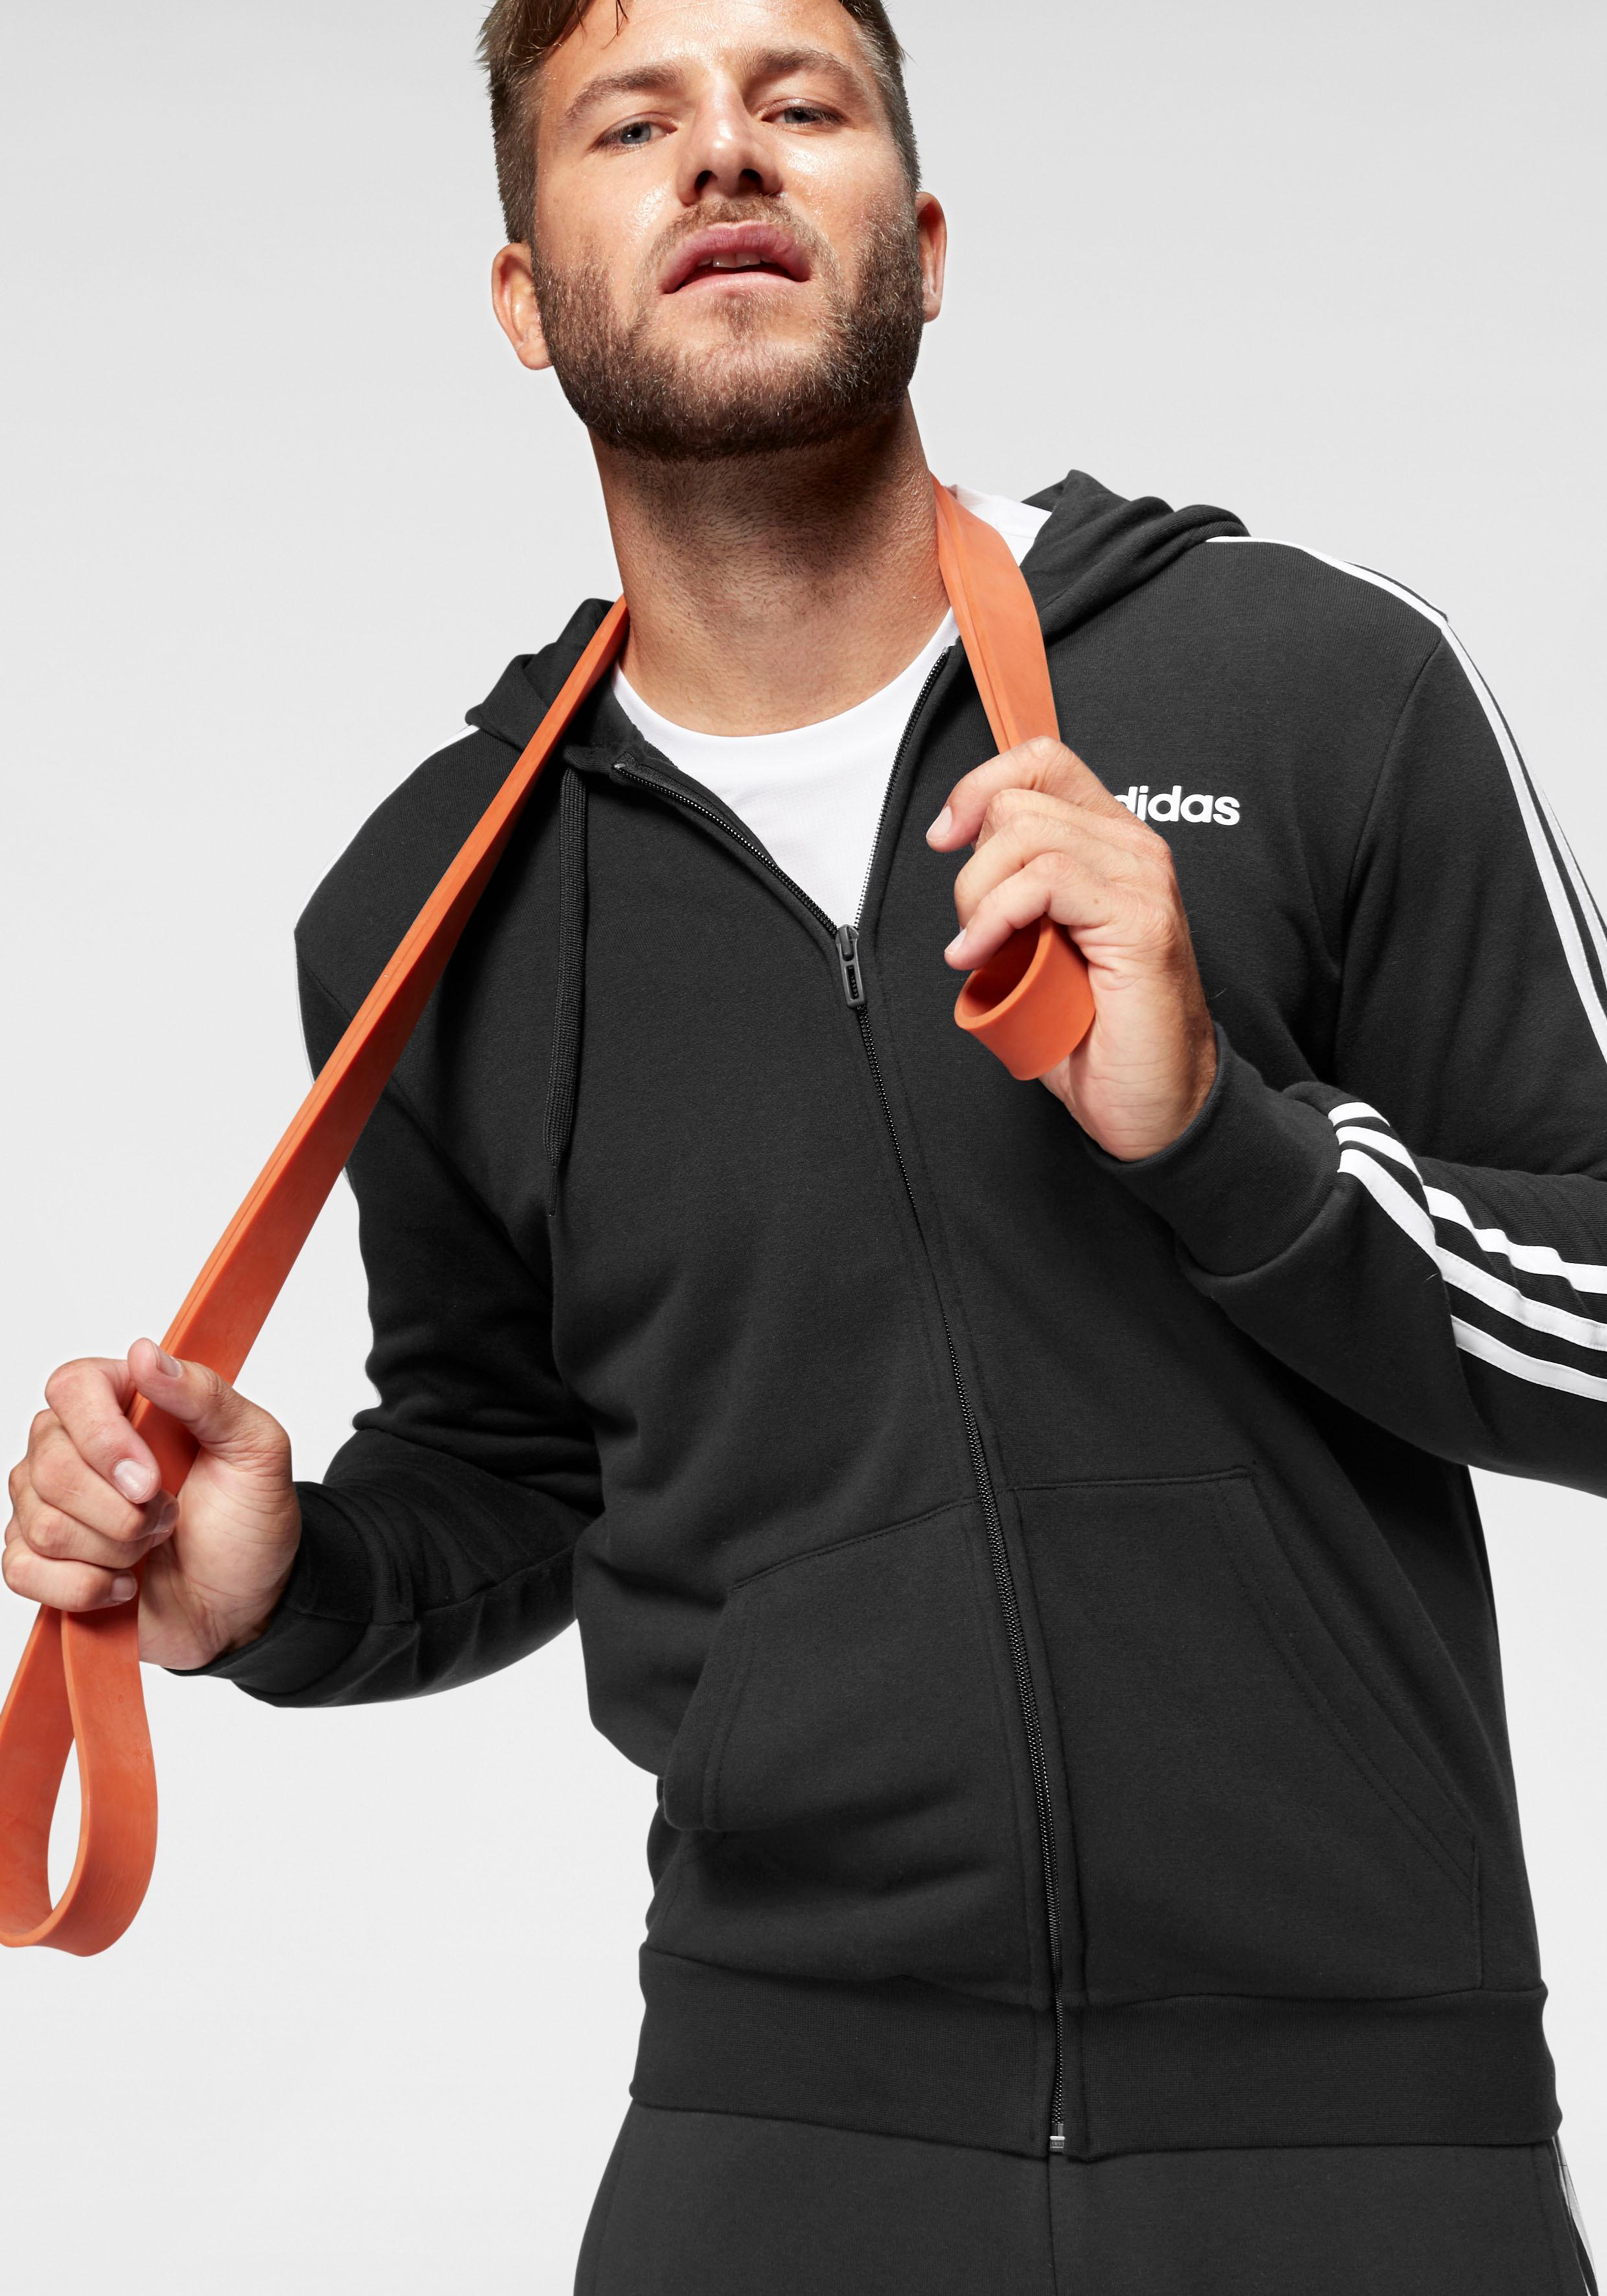 adidas Kapuzensweatjacke  ESSENTIALS 3 STRIPES FULL ZIP FRENCH TERRY  Preisvergleich